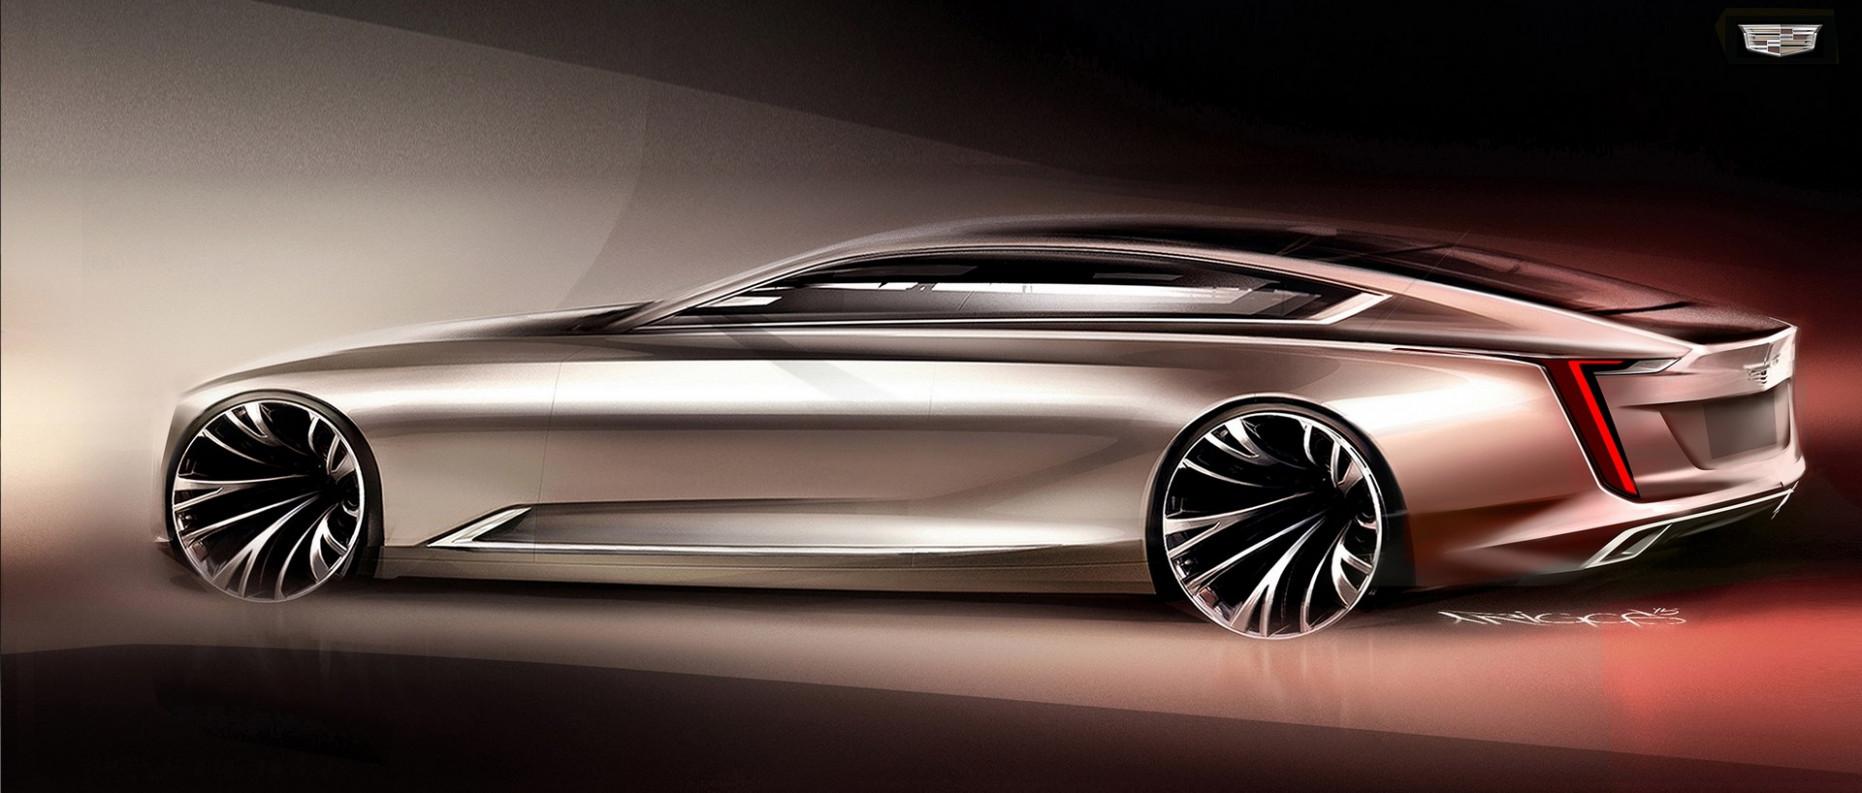 Spy Shoot Cadillac Coupe 2022